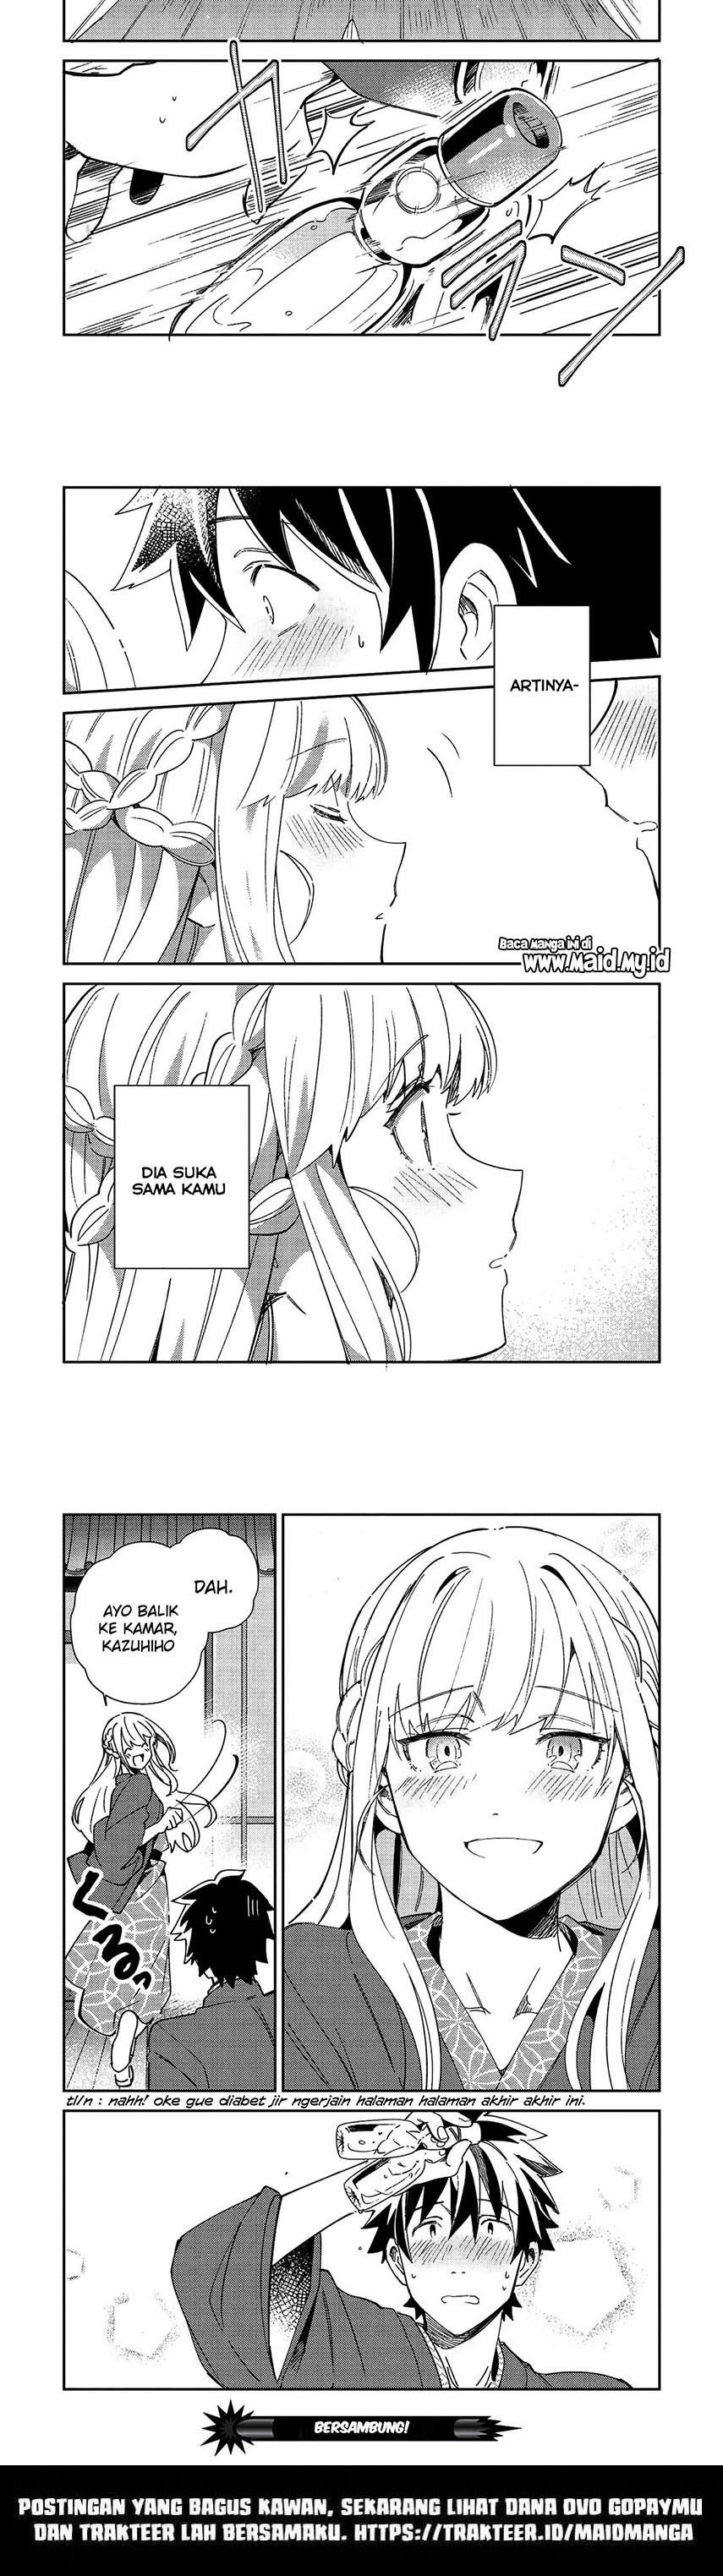 Nihon e Youkoso Elf-san.: Chapter 26 - Page 12